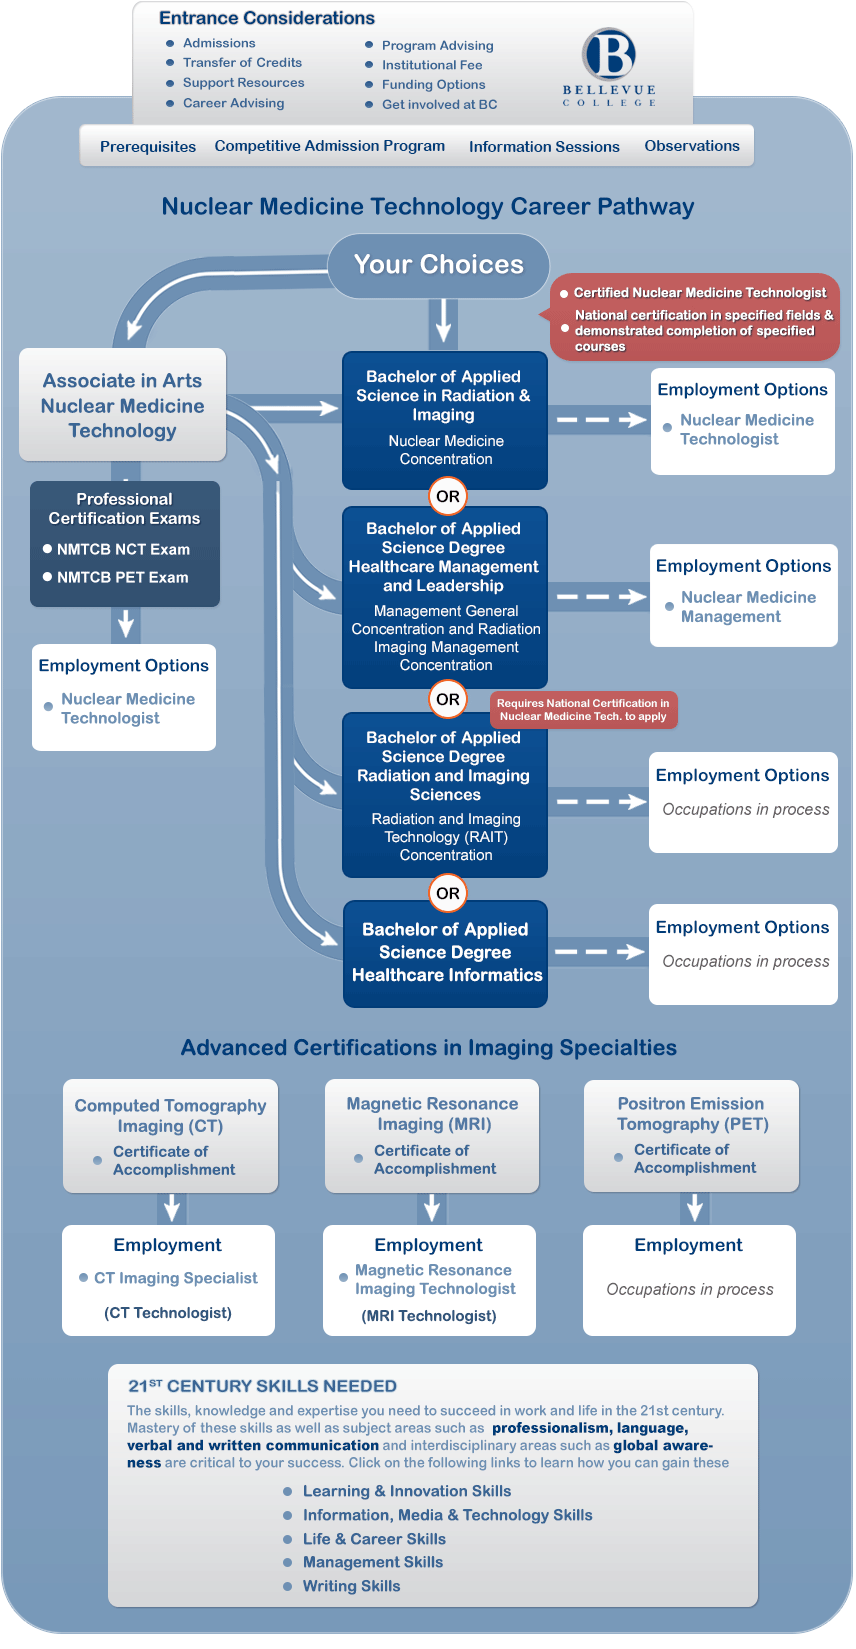 Nuclear Medicine Technology Career Pathways